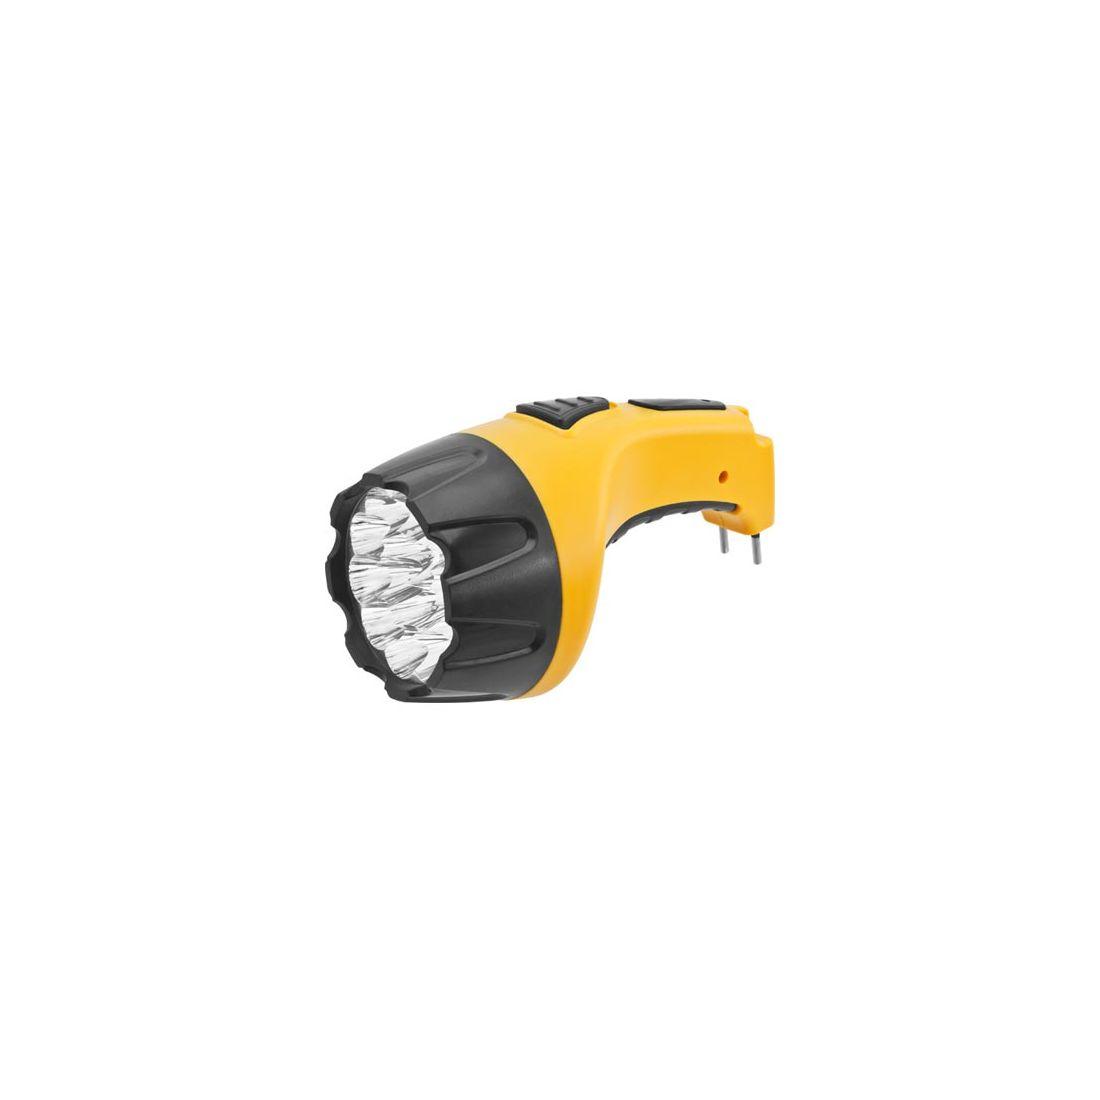 Фонарь ручной Navigator NPT-CP05-ACCU 22 LED, желтый, NPT-CP05-ACCU 94953